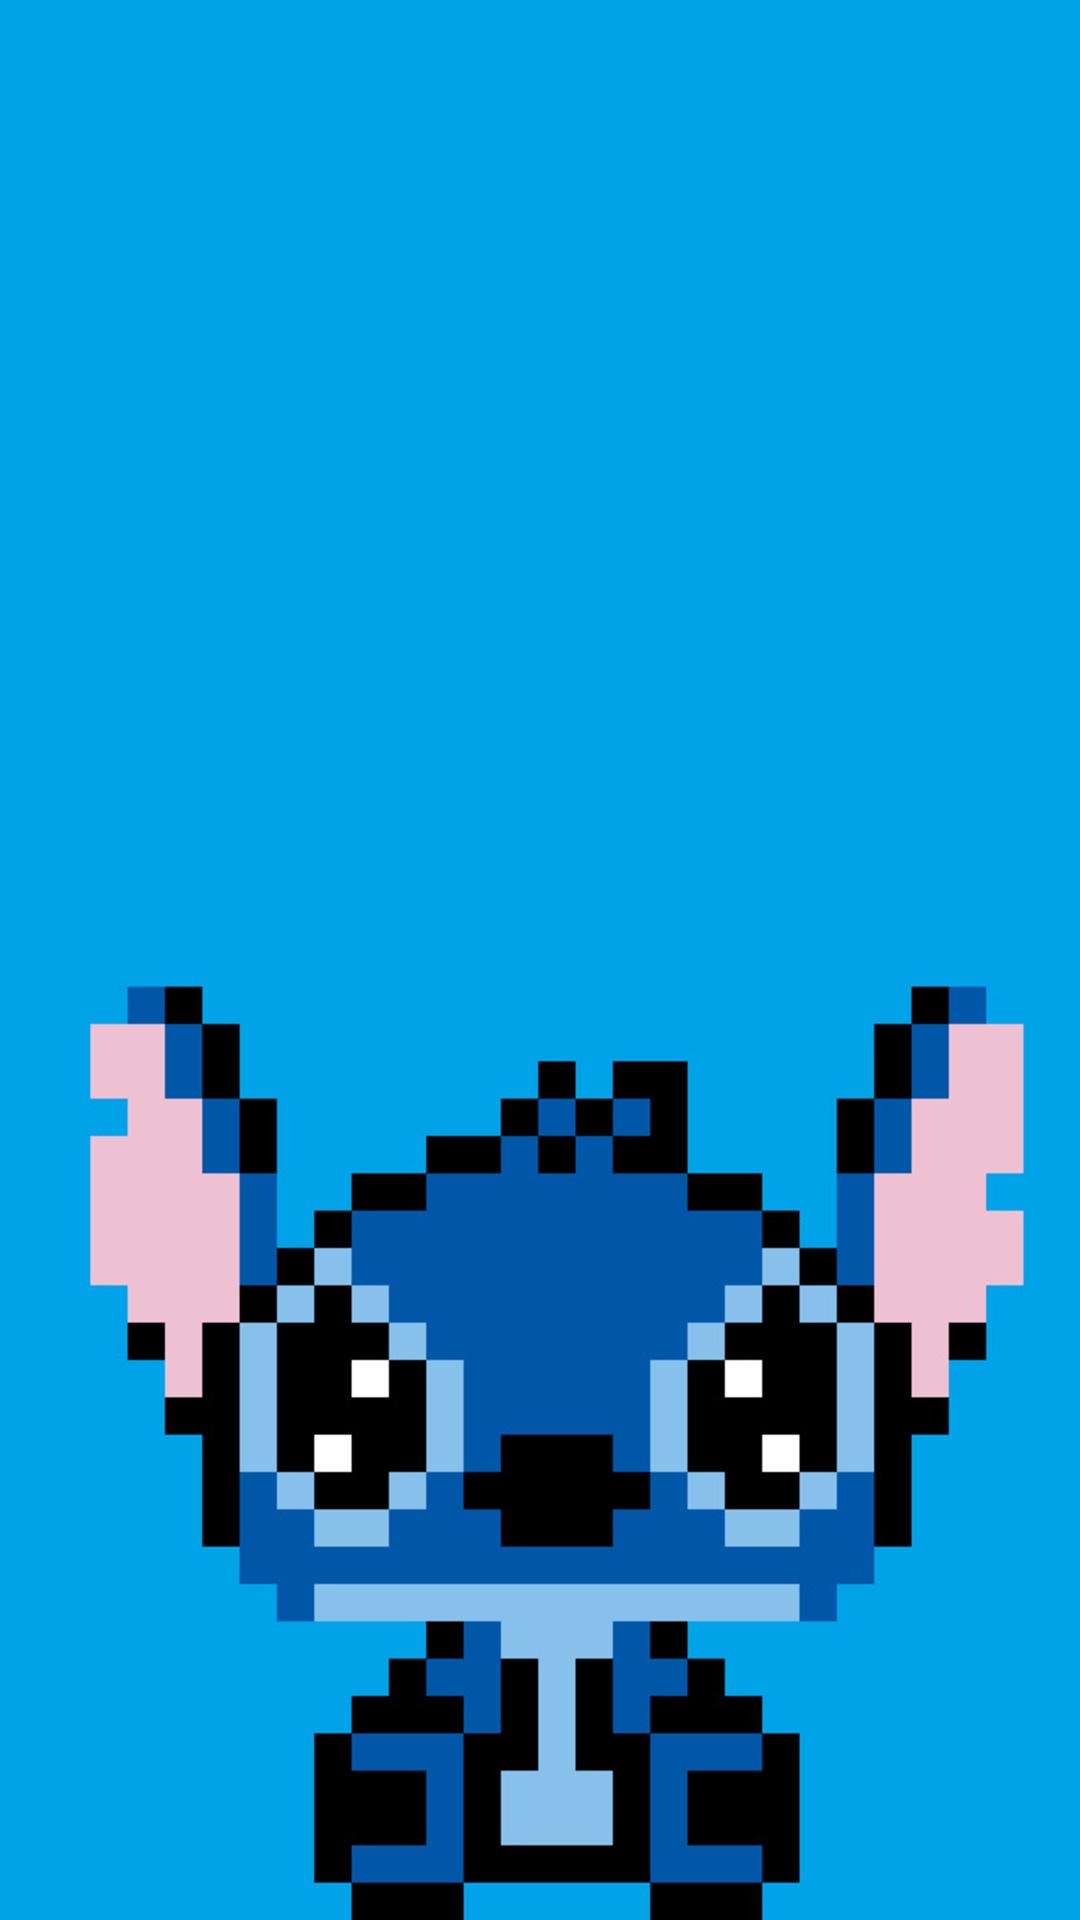 Stitch Cute Wallpaper For Computer 1080x1920 Stitch Pixel Art Iphone 7 6s 6 Plus Pixel Xl